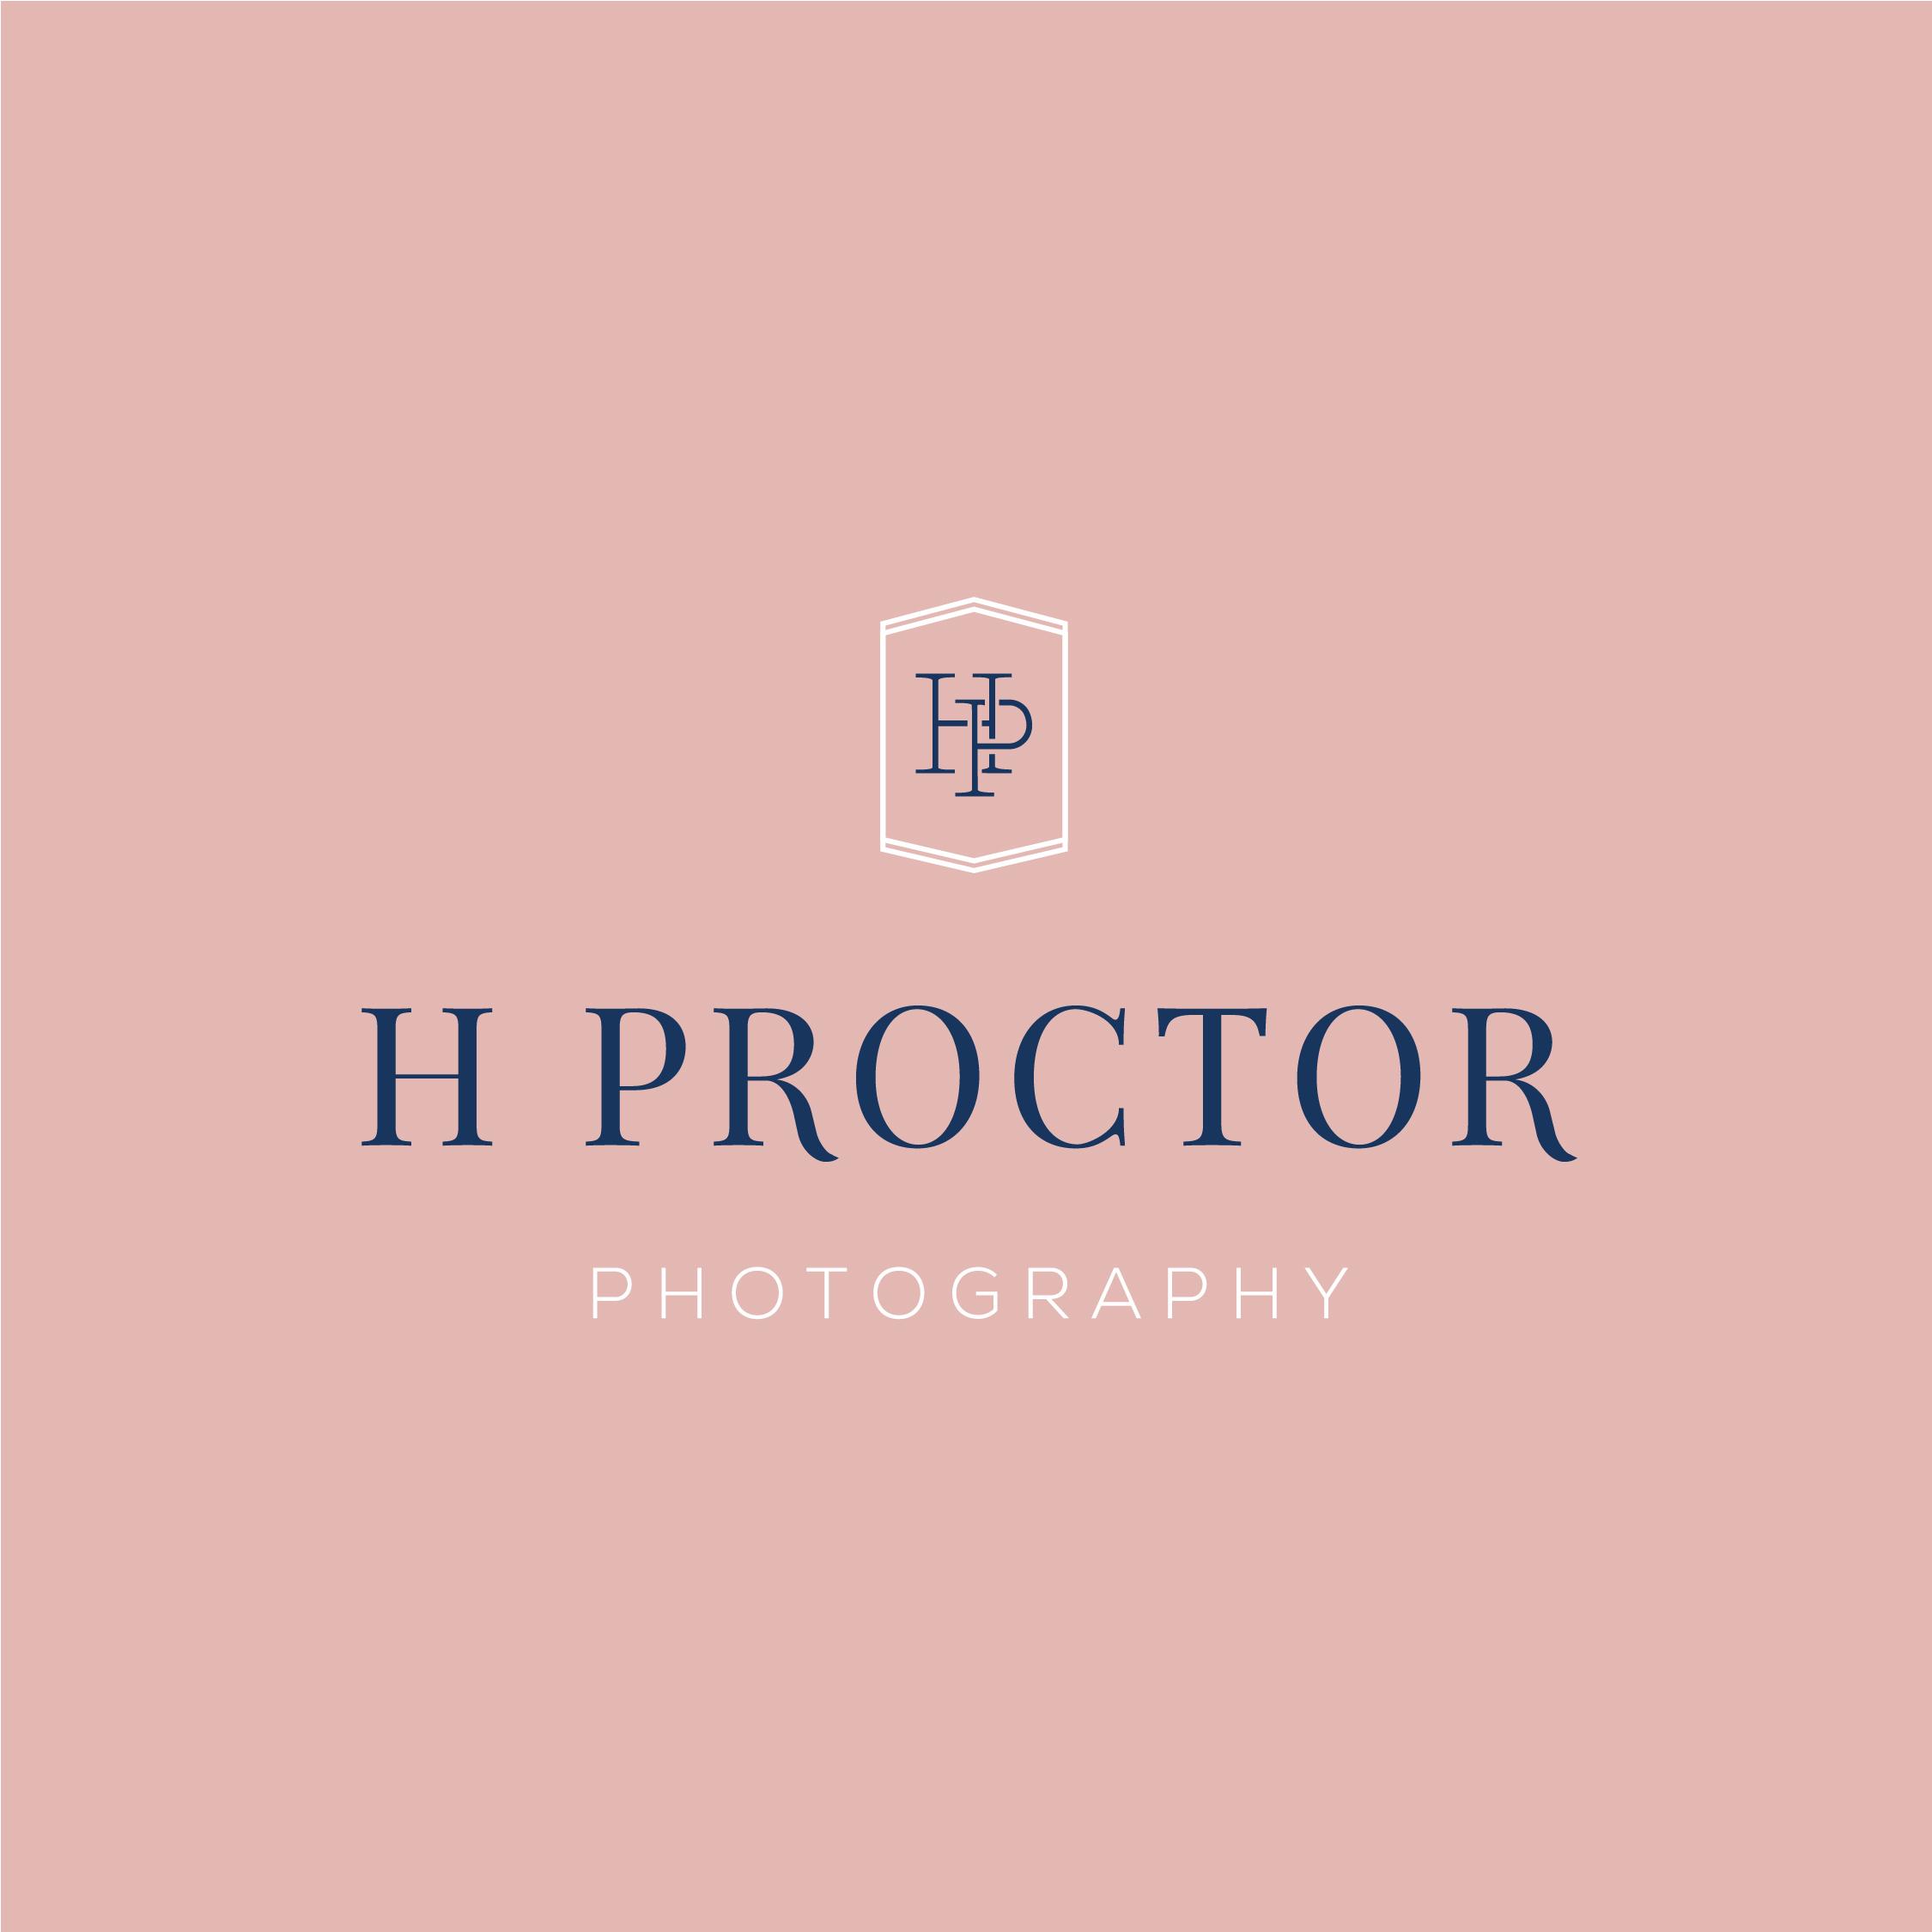 HayleyBighamDesigns-HProctorPhotography-Rebrand-MainLogoDesign-Branding.jpg